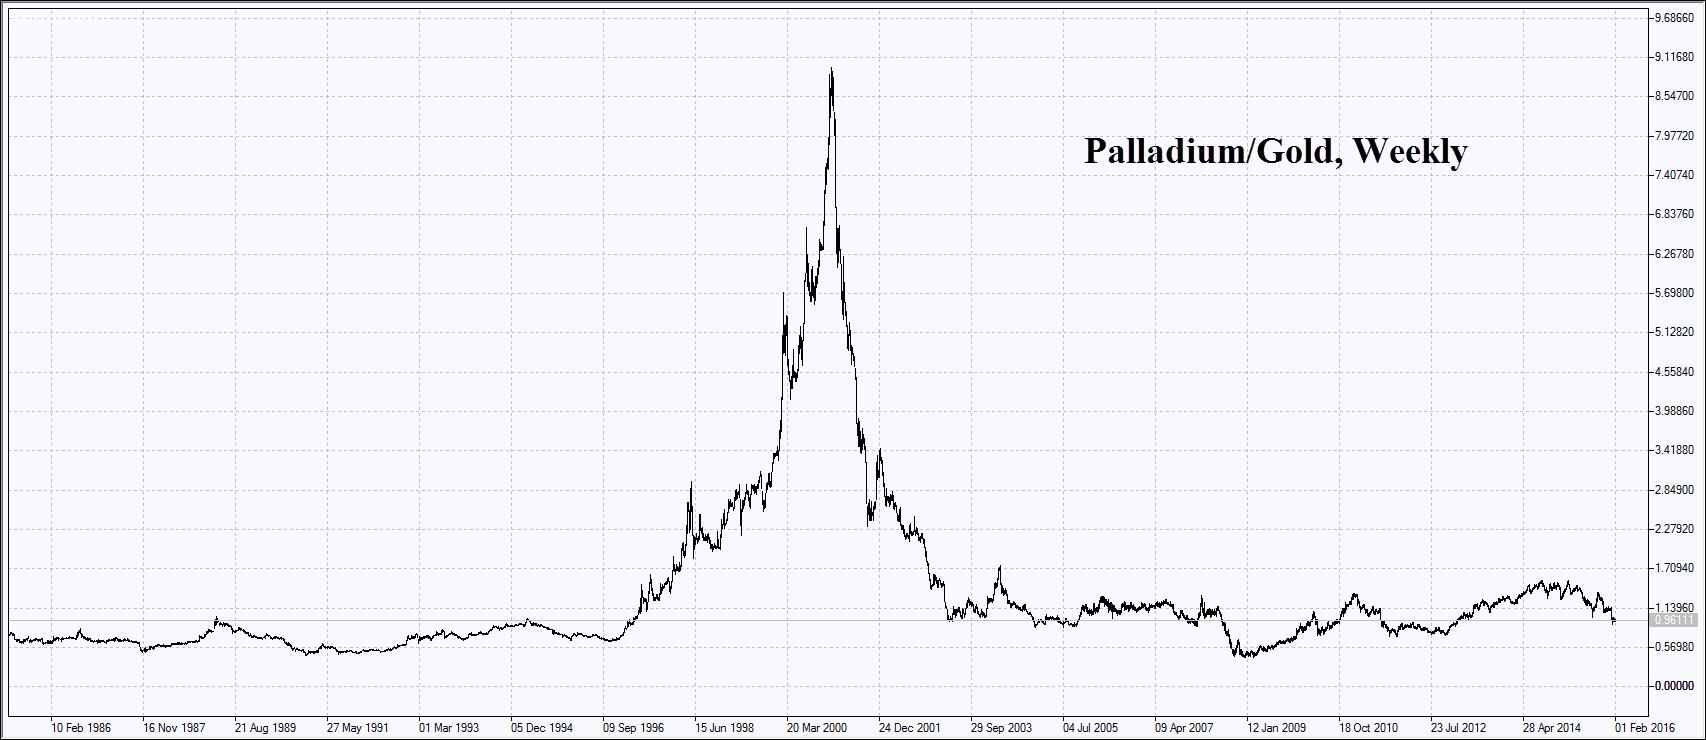 Palladium/Gold Weekly Chart